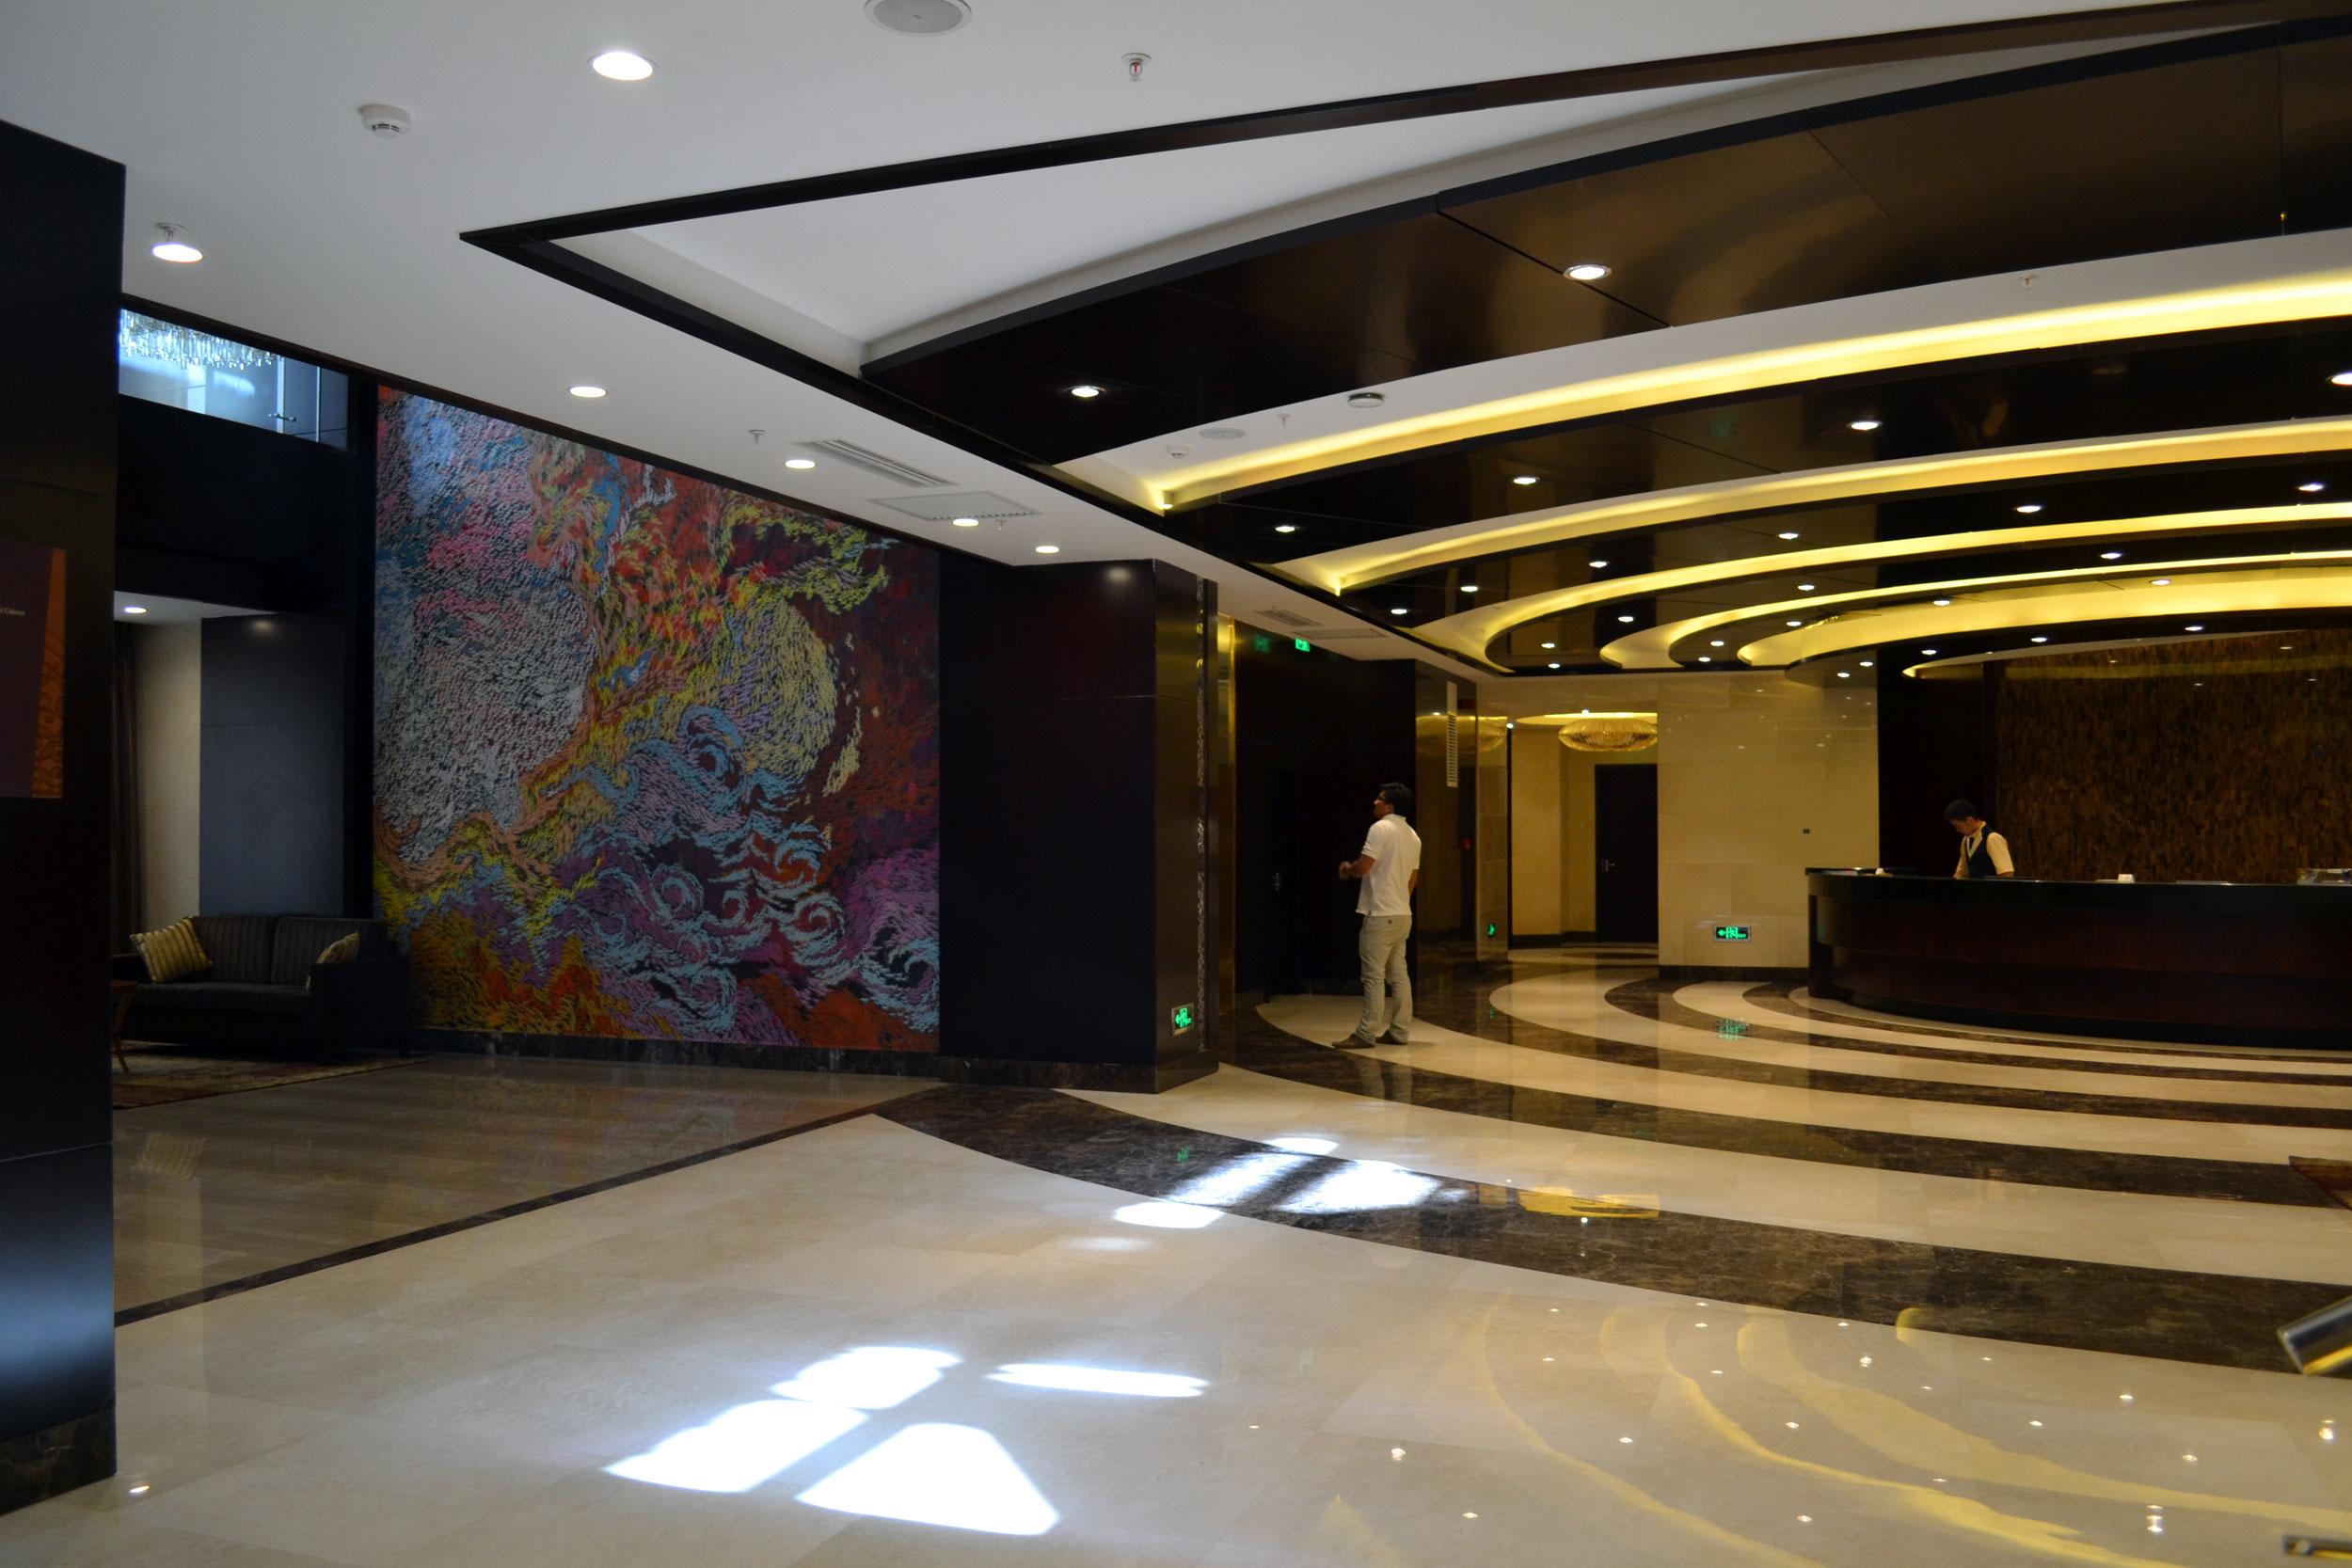 My homeland my steed by otgo otgonbayar ershuu for Decor hotel ulaanbaatar mongolia